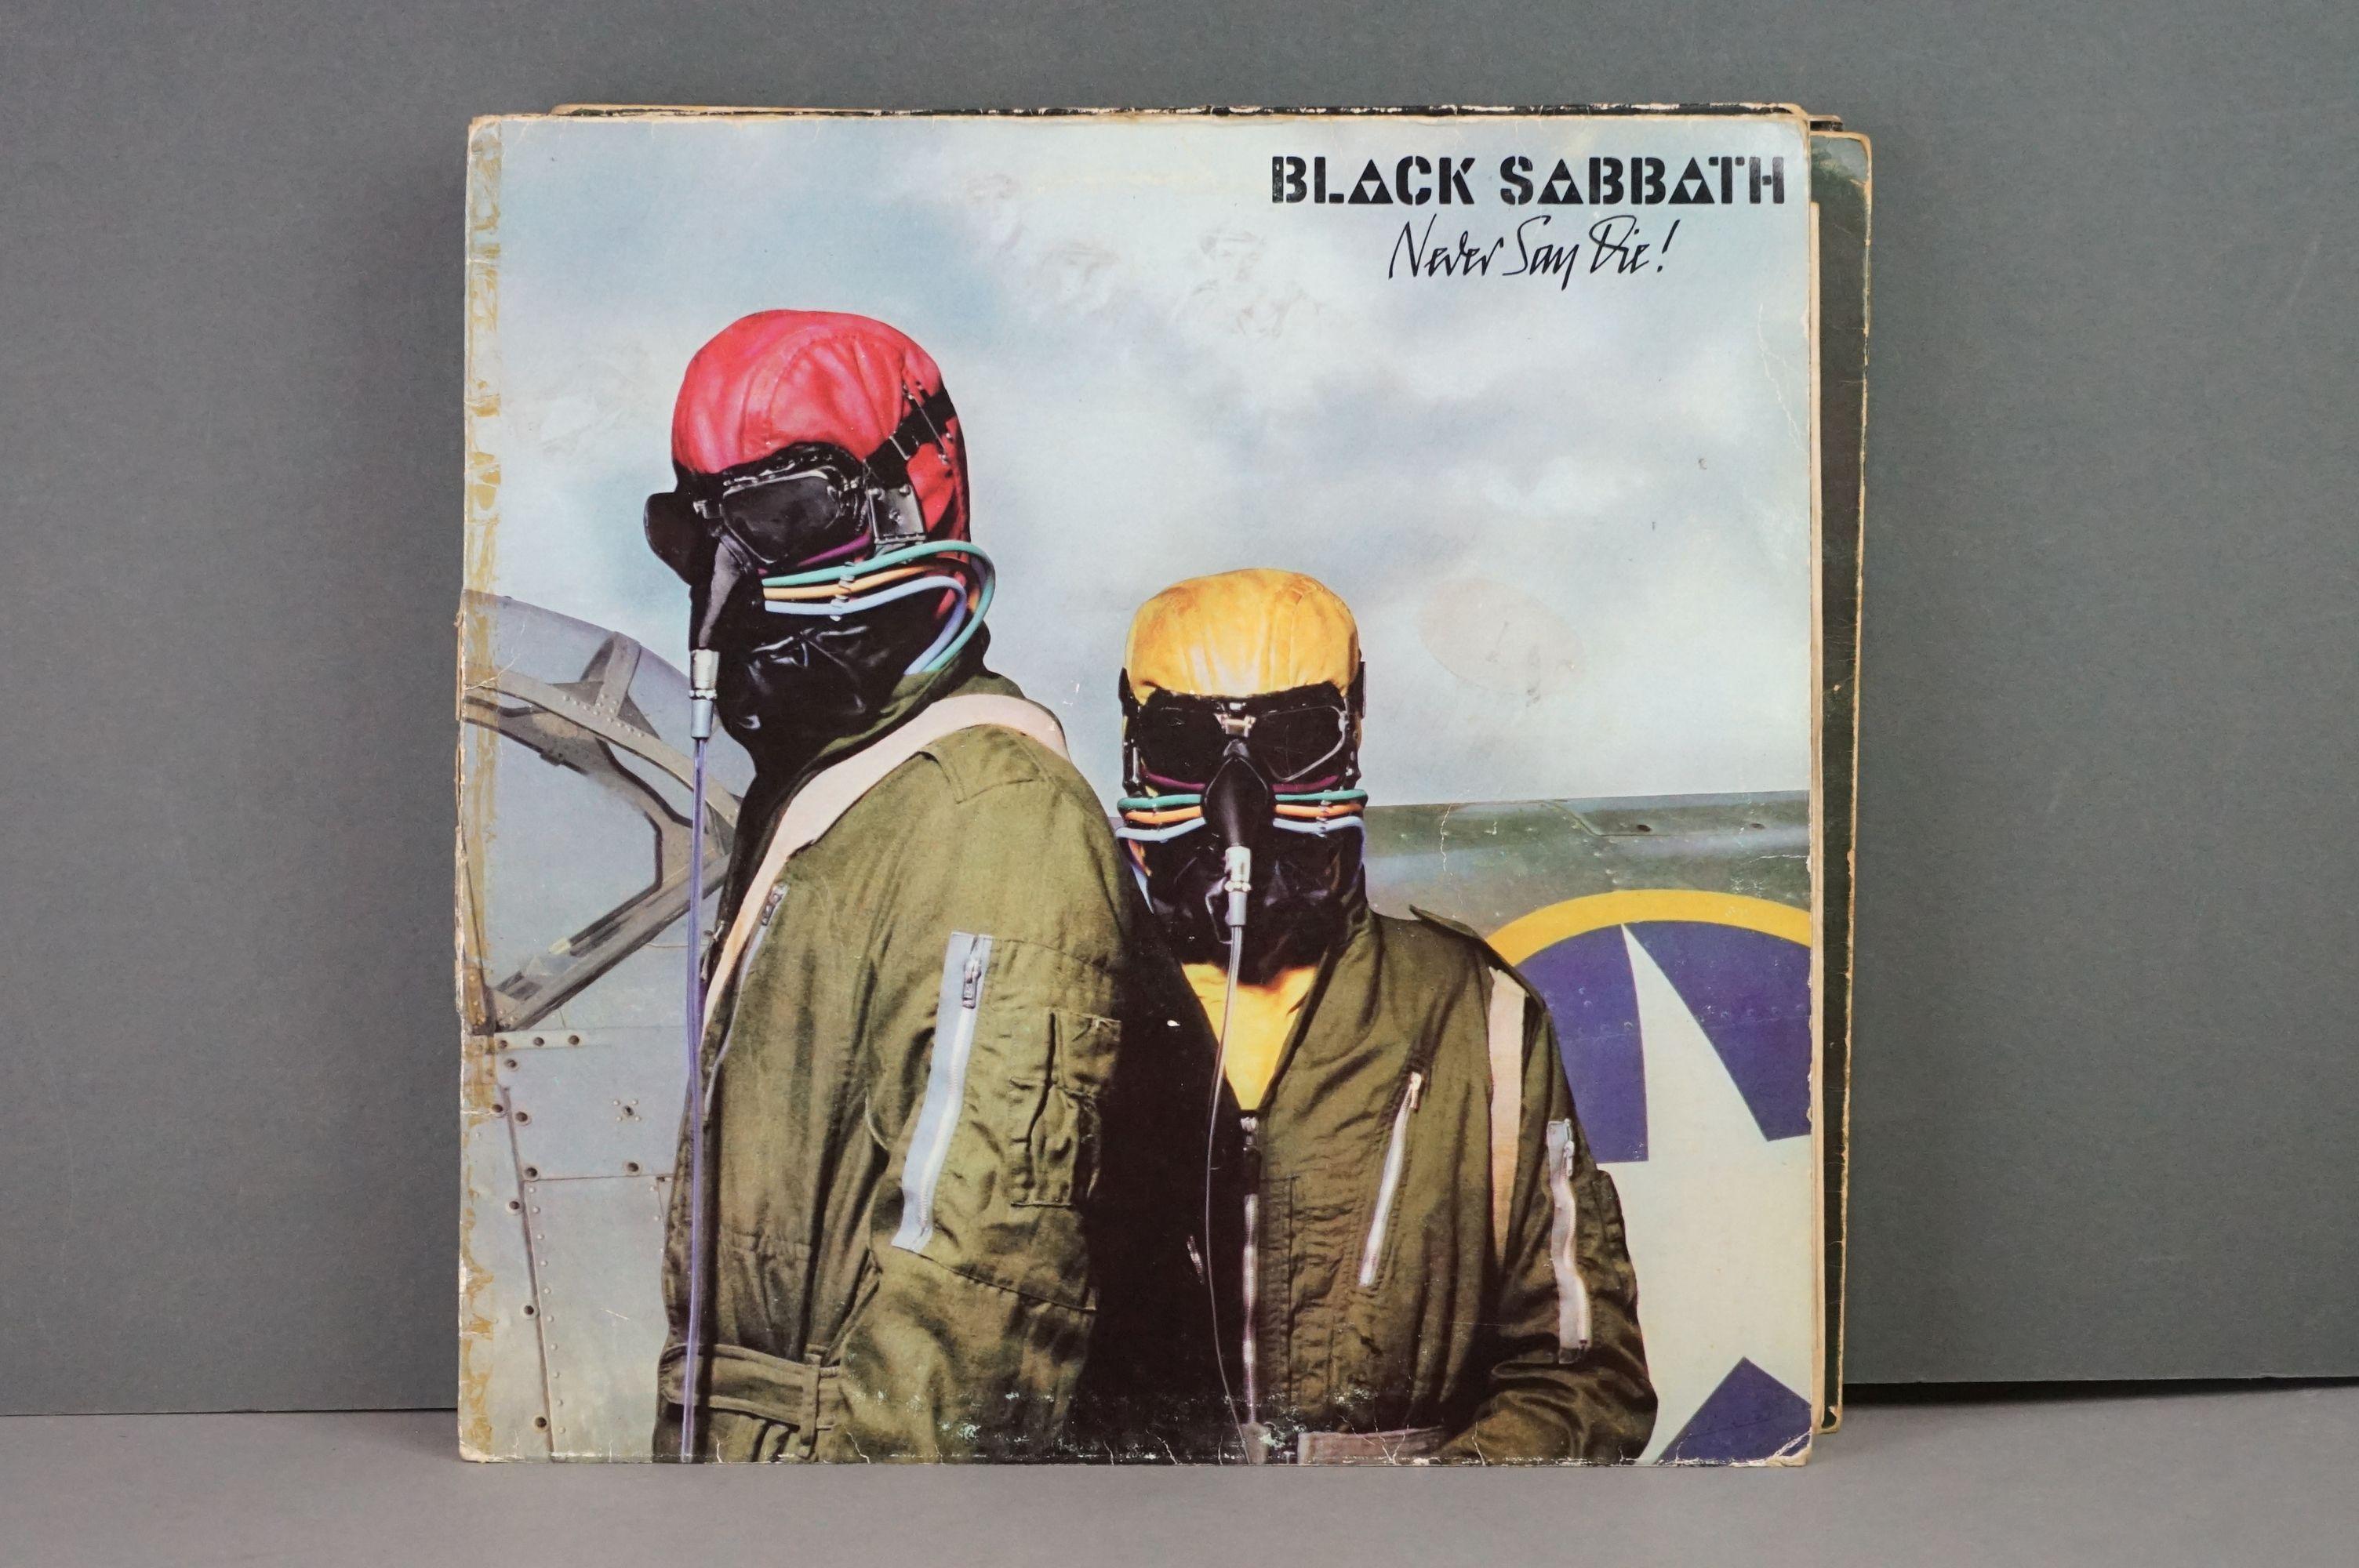 Vinyl - Twelve Black Sabbath vinyl LP's to include Technical Ecstasy (Vertigo Records PRICE 40), - Image 6 of 17